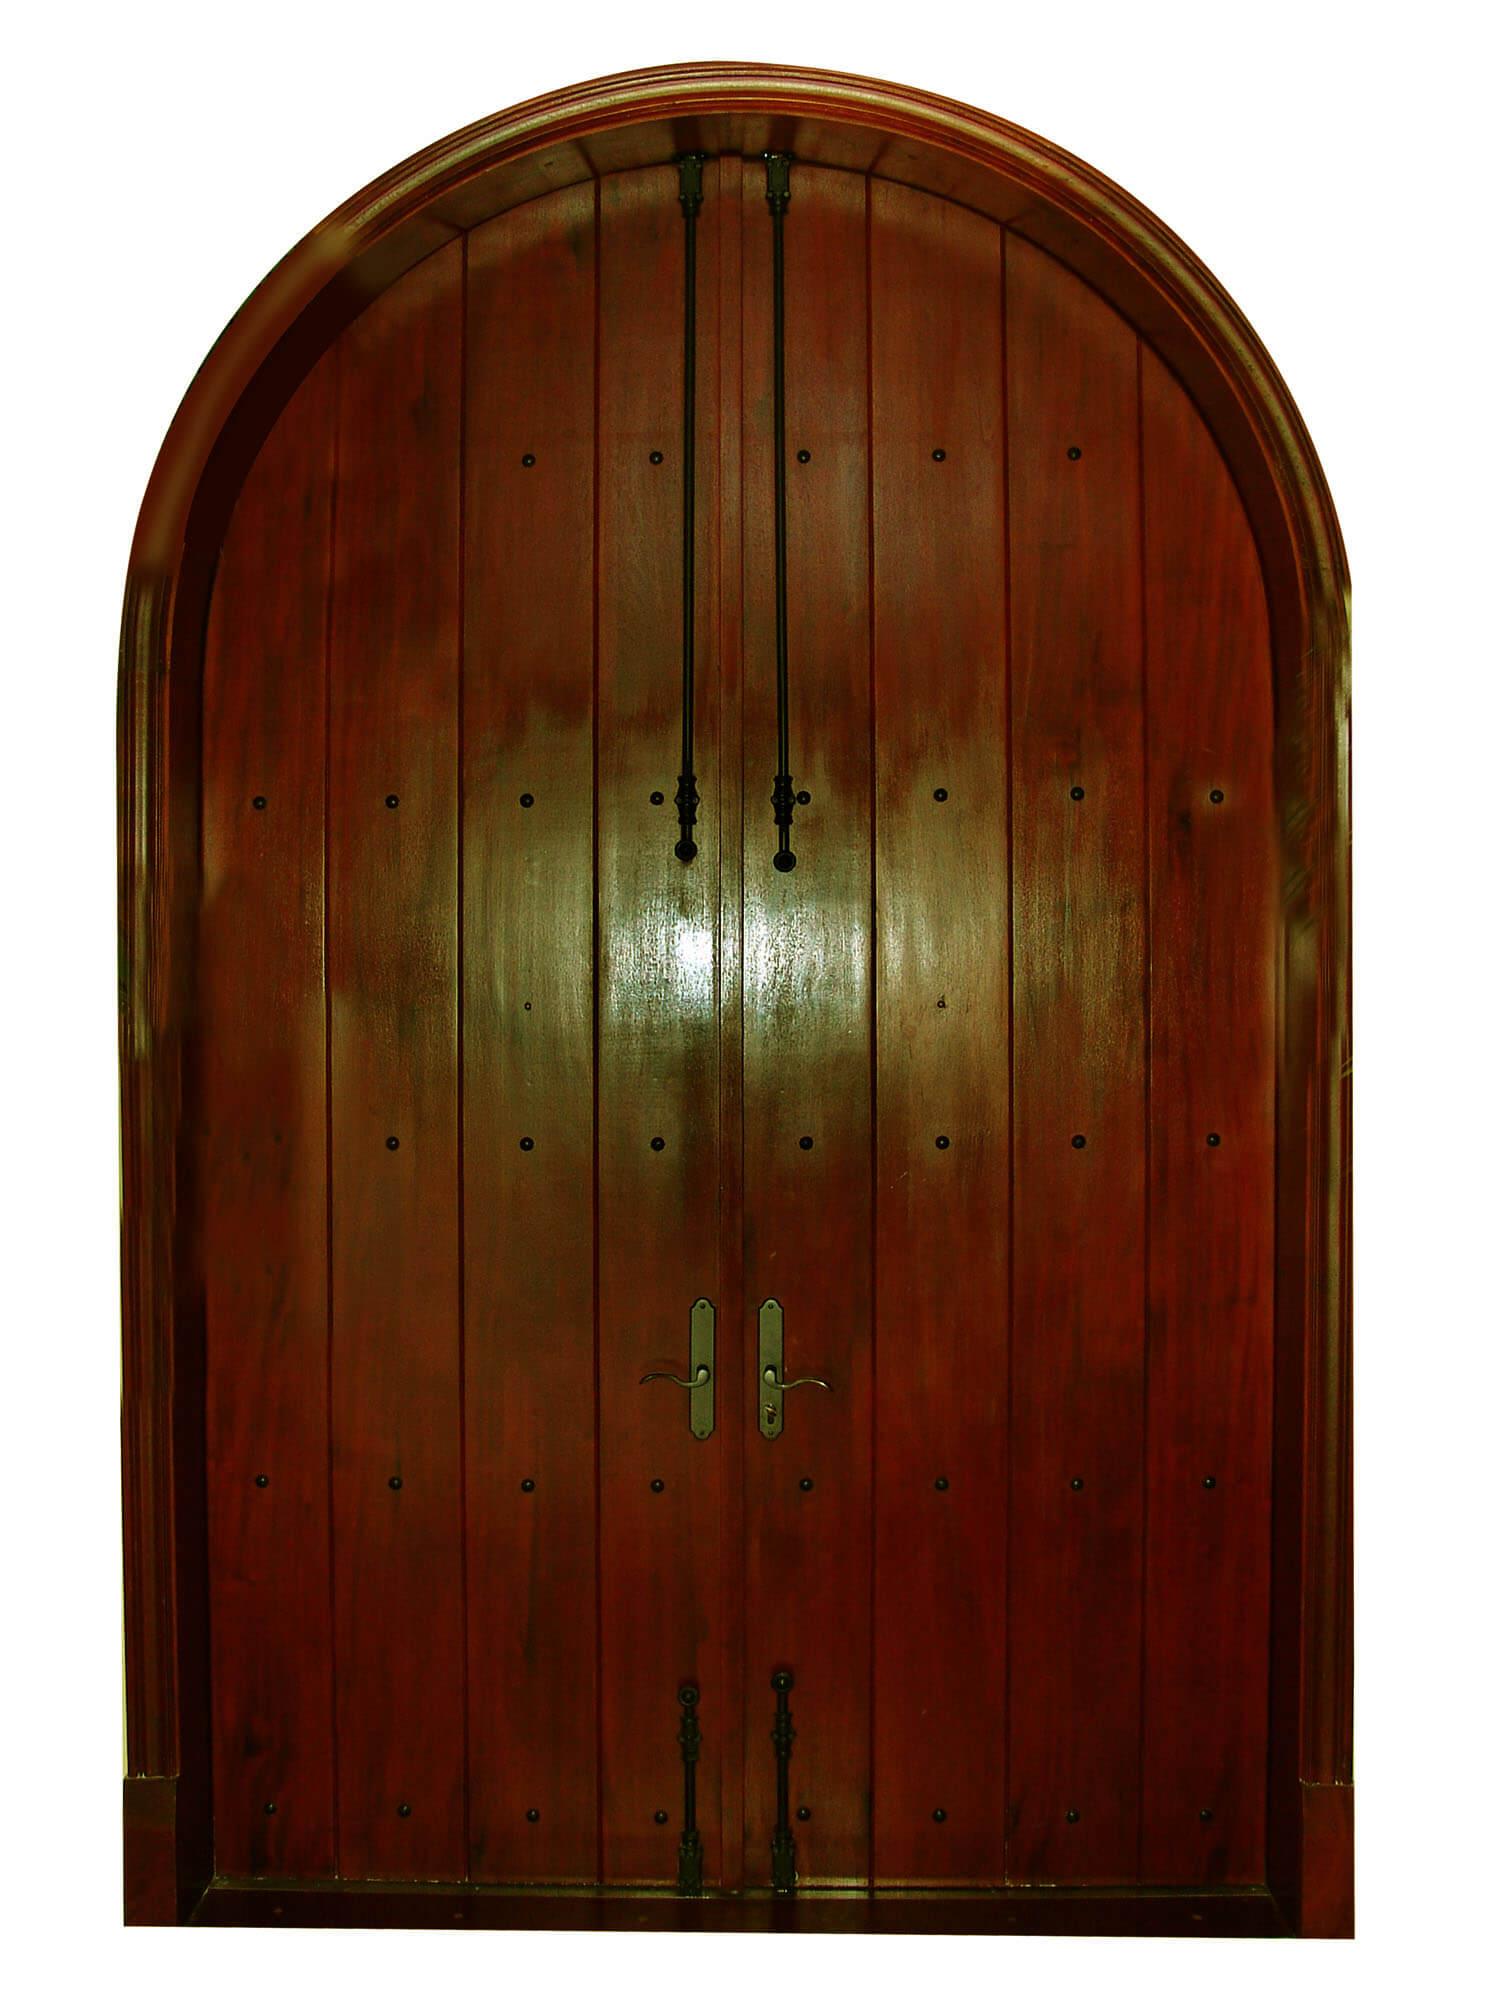 ANNA MARIA ISLAND INTERIOR VIEW OF MAHOGANY DOOR